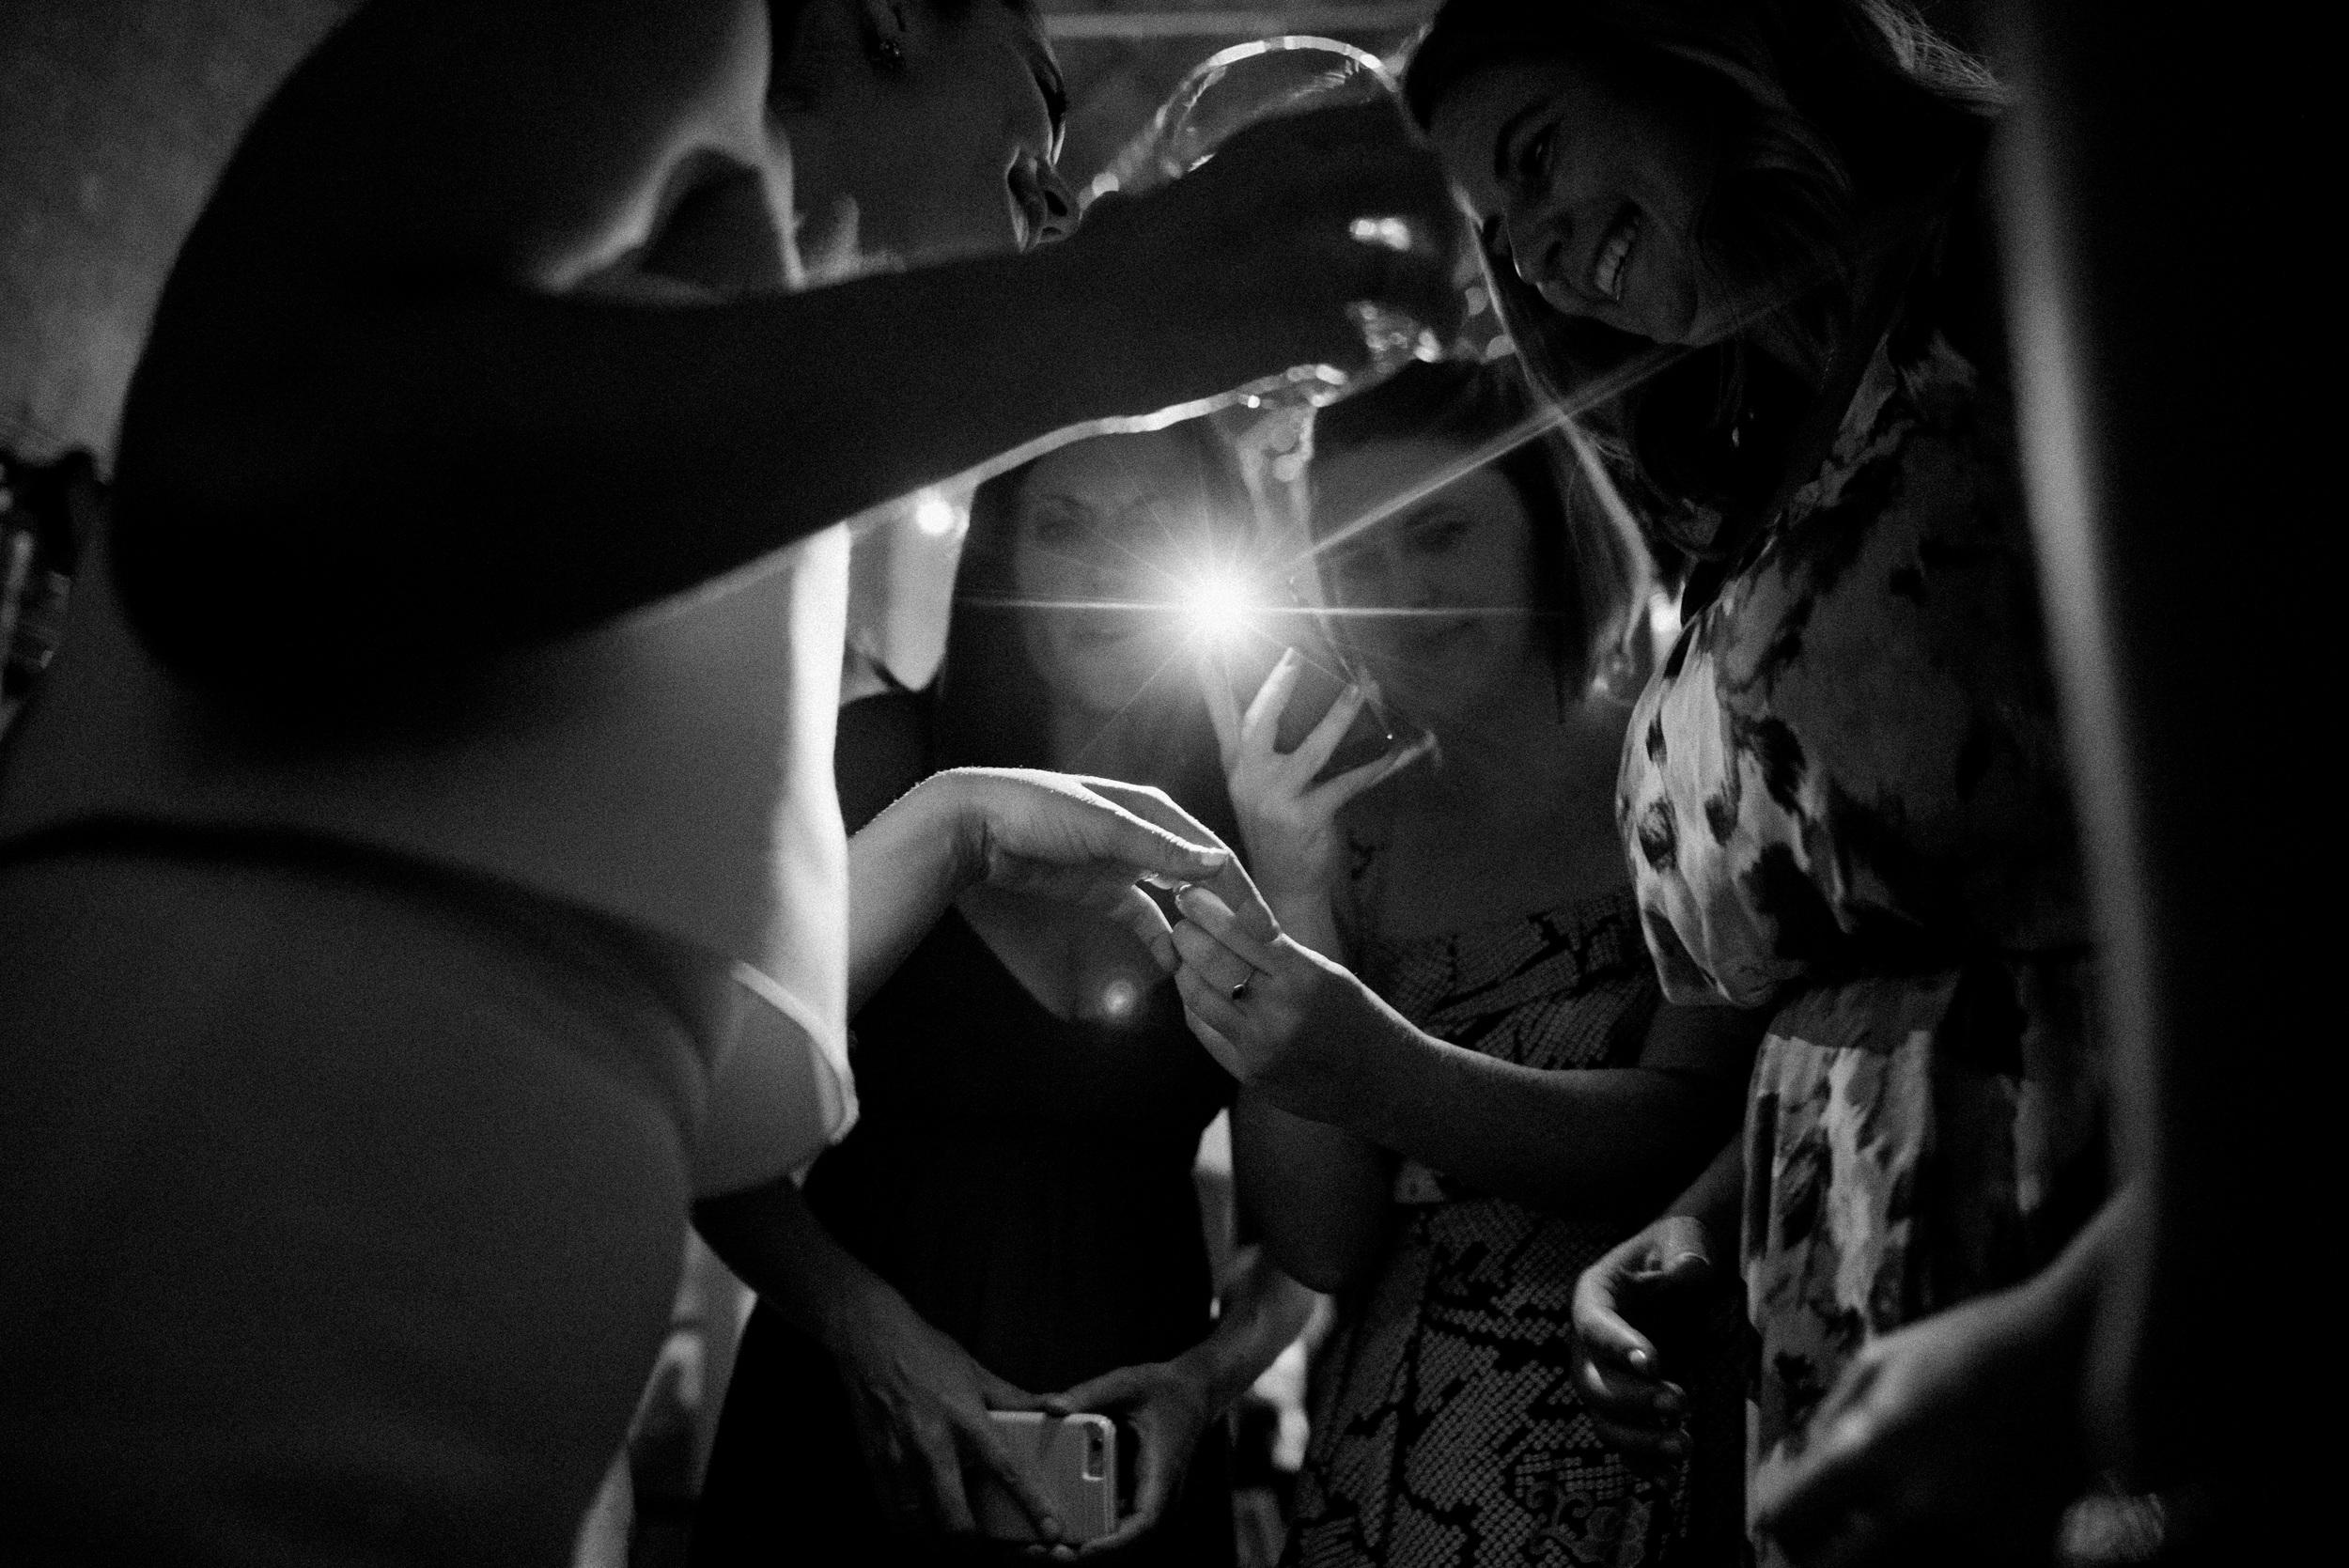 Women admiring bride's wedding ring